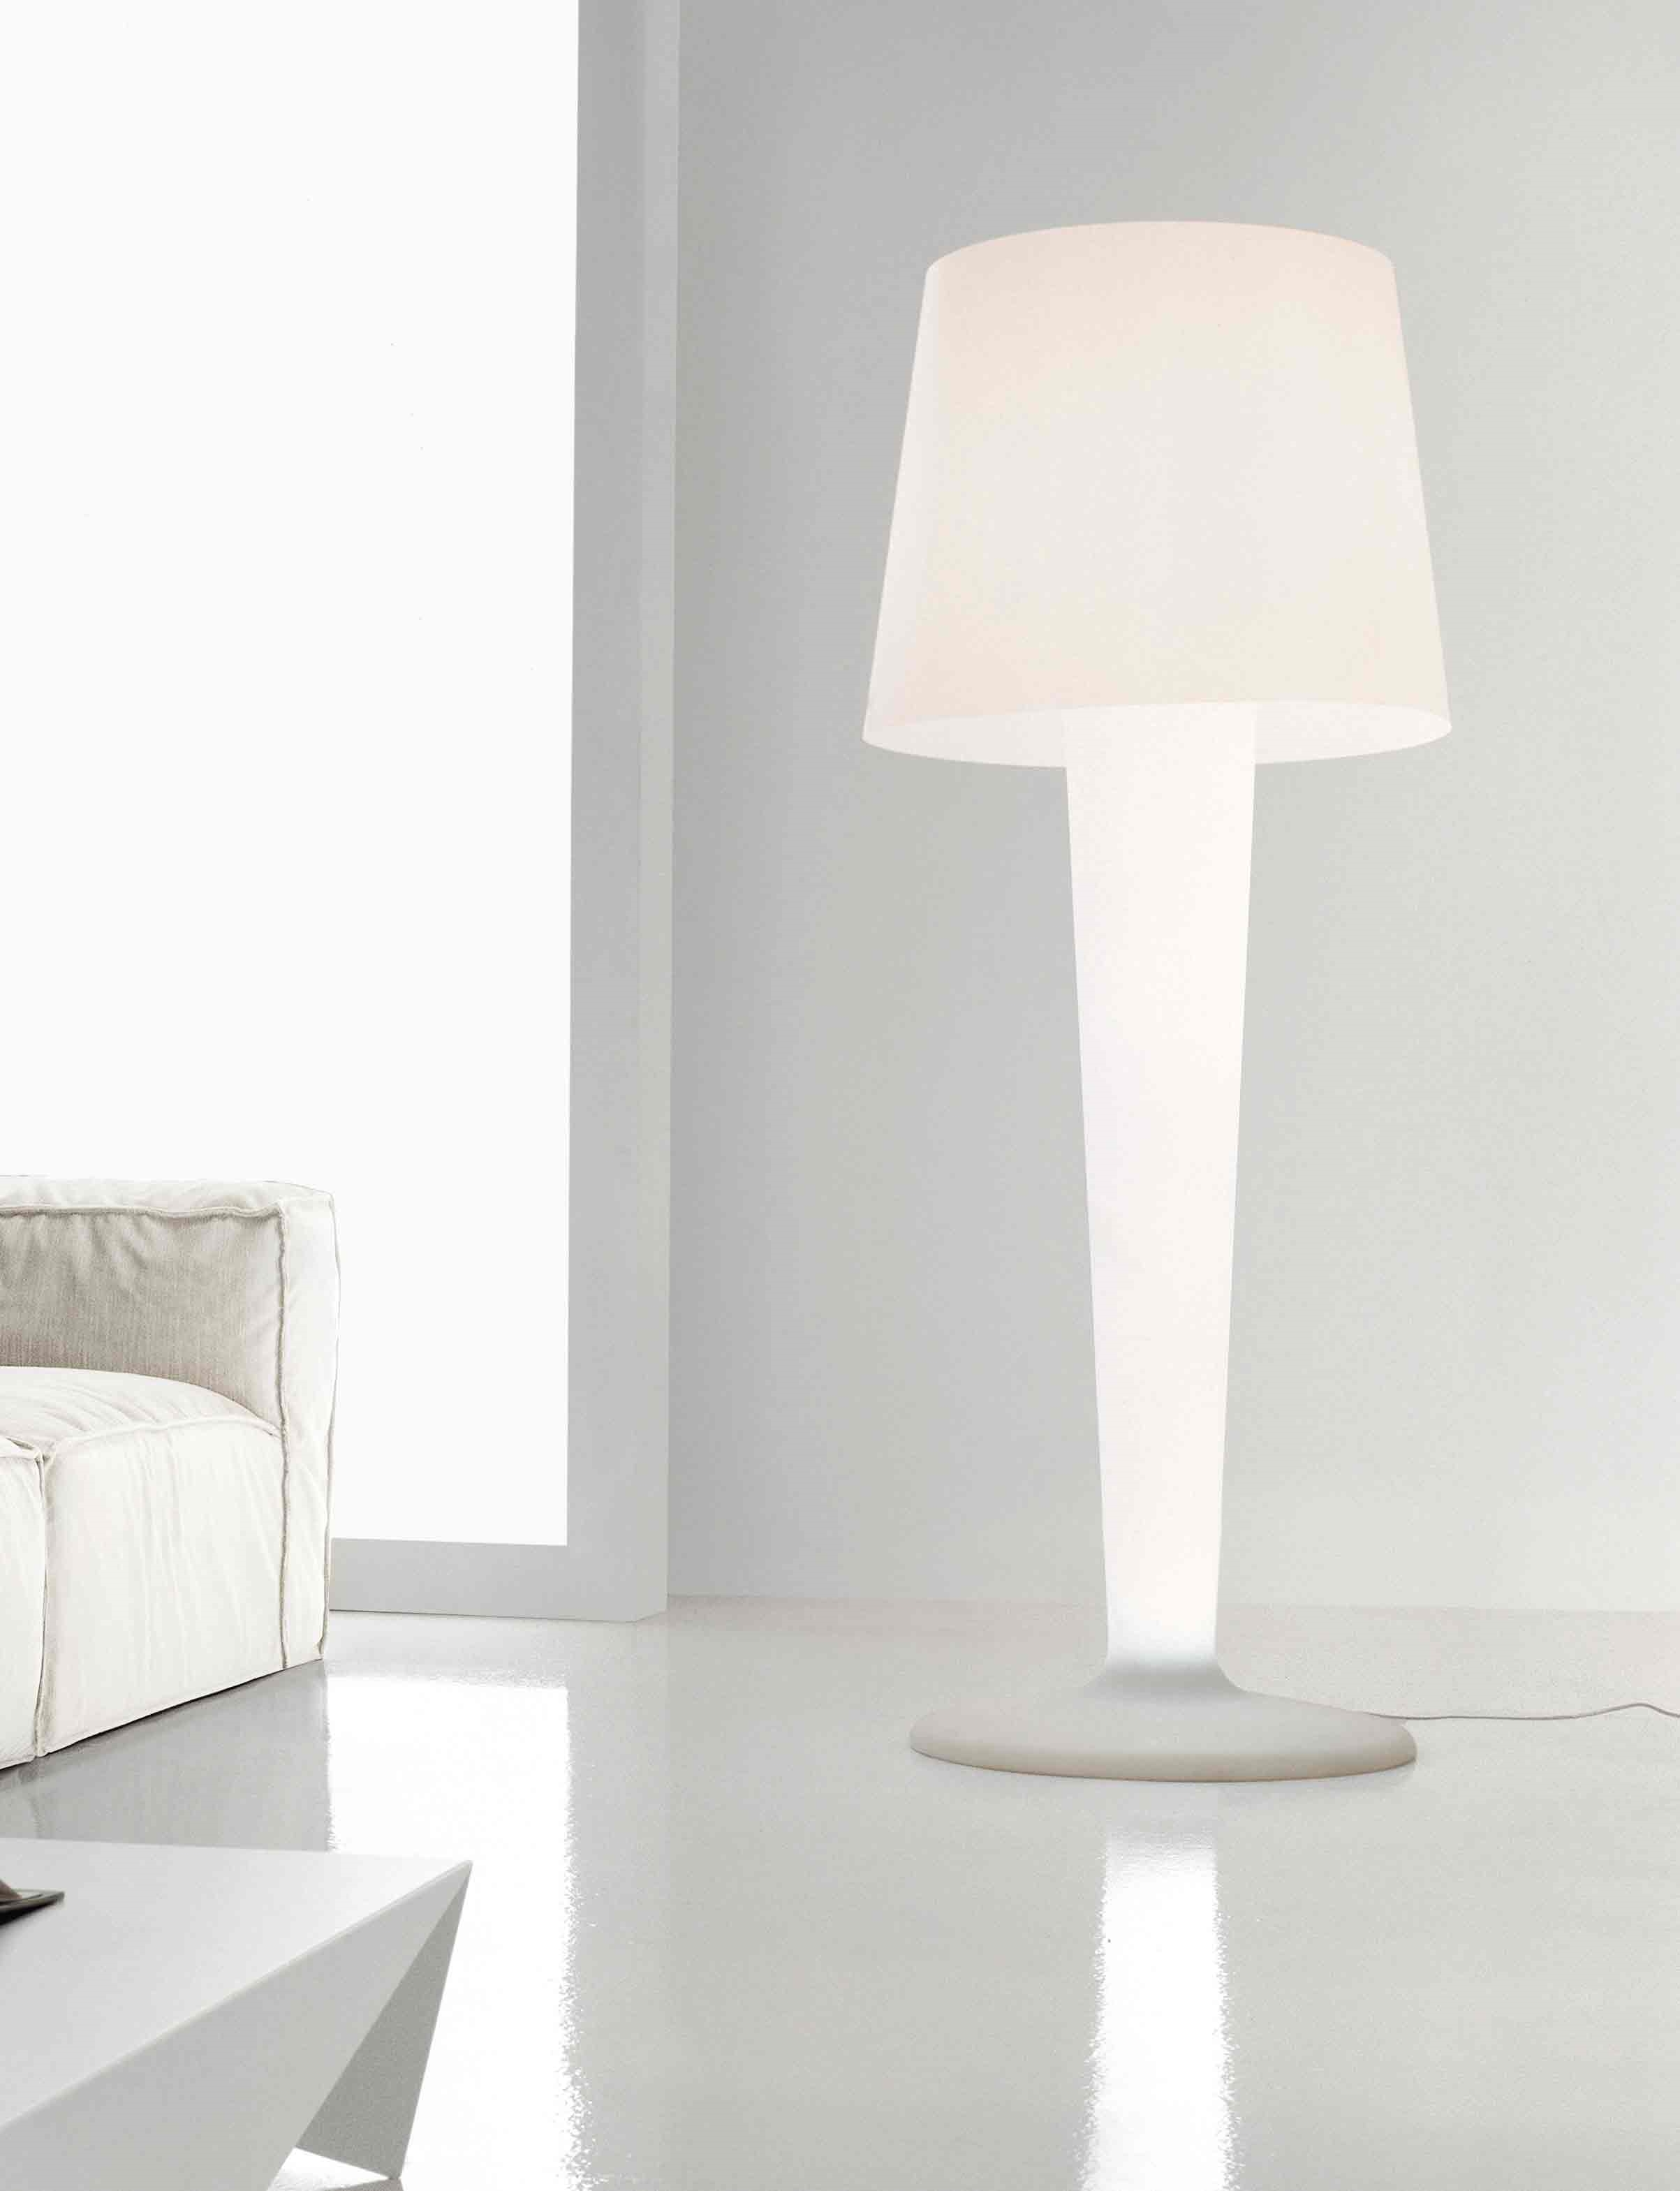 Bonaldo XXLight lampada da terra - Illuminazione a prezzi scontati